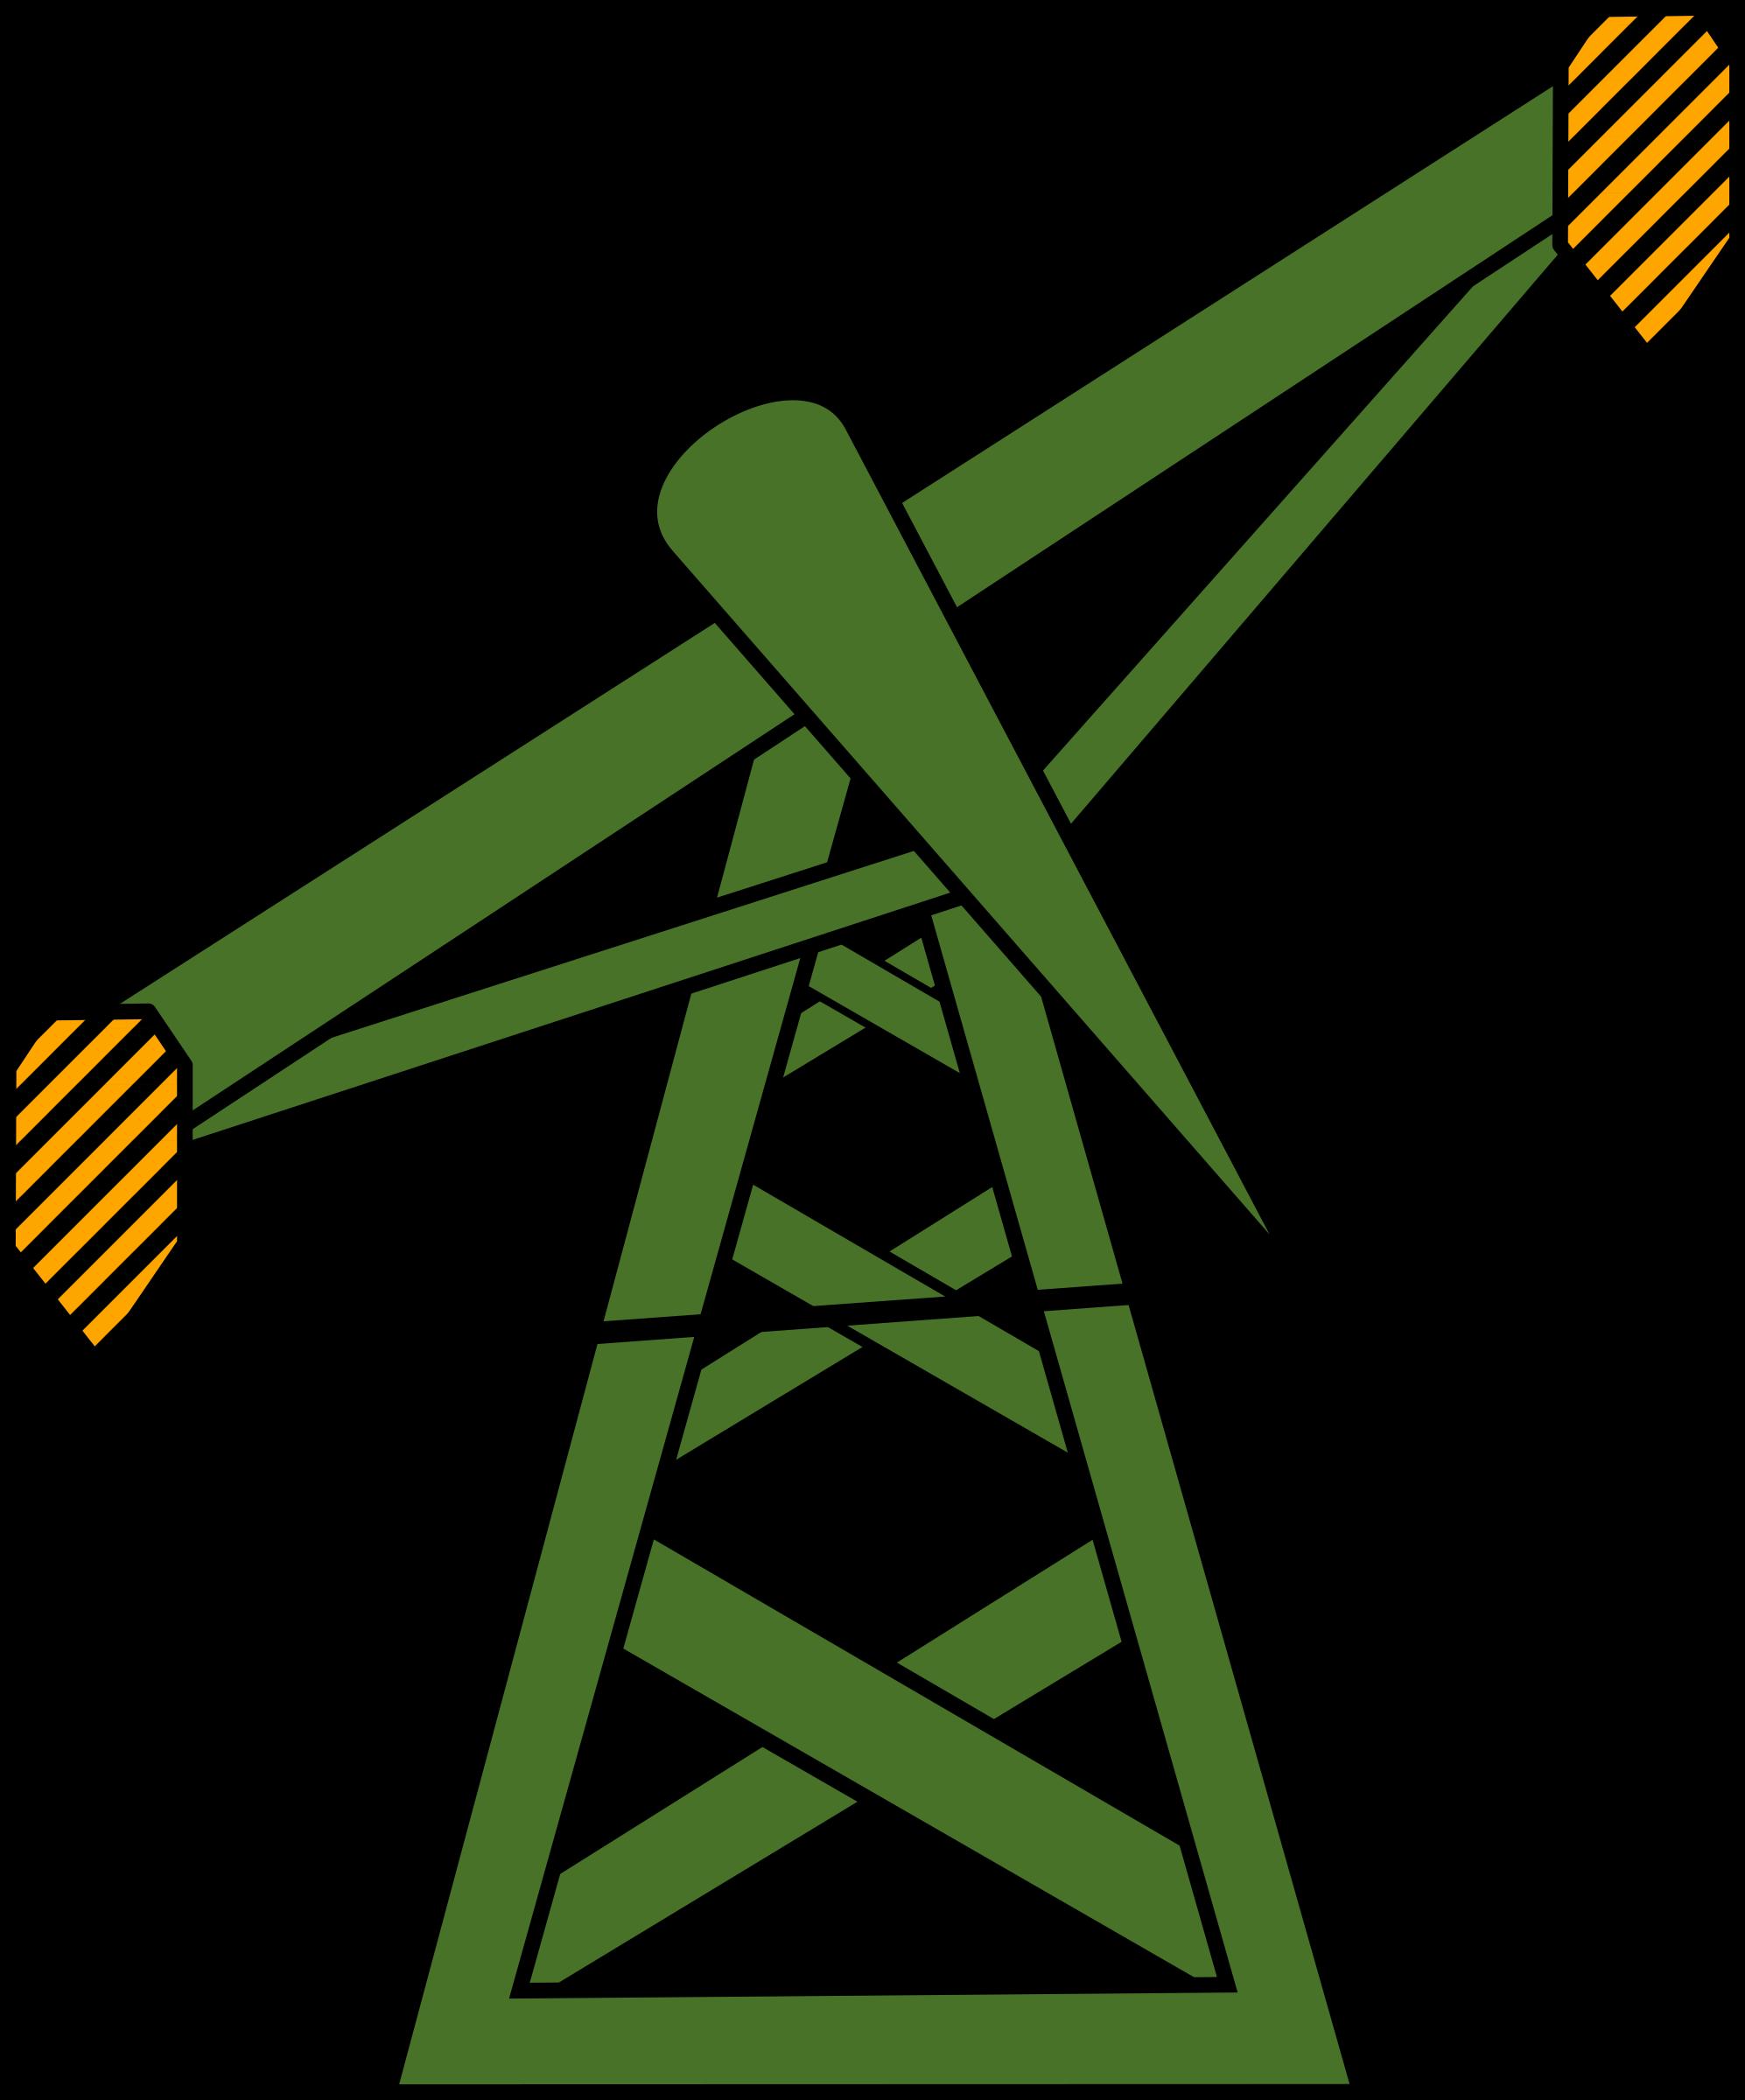 Pump big image png. Energy clipart natural gas